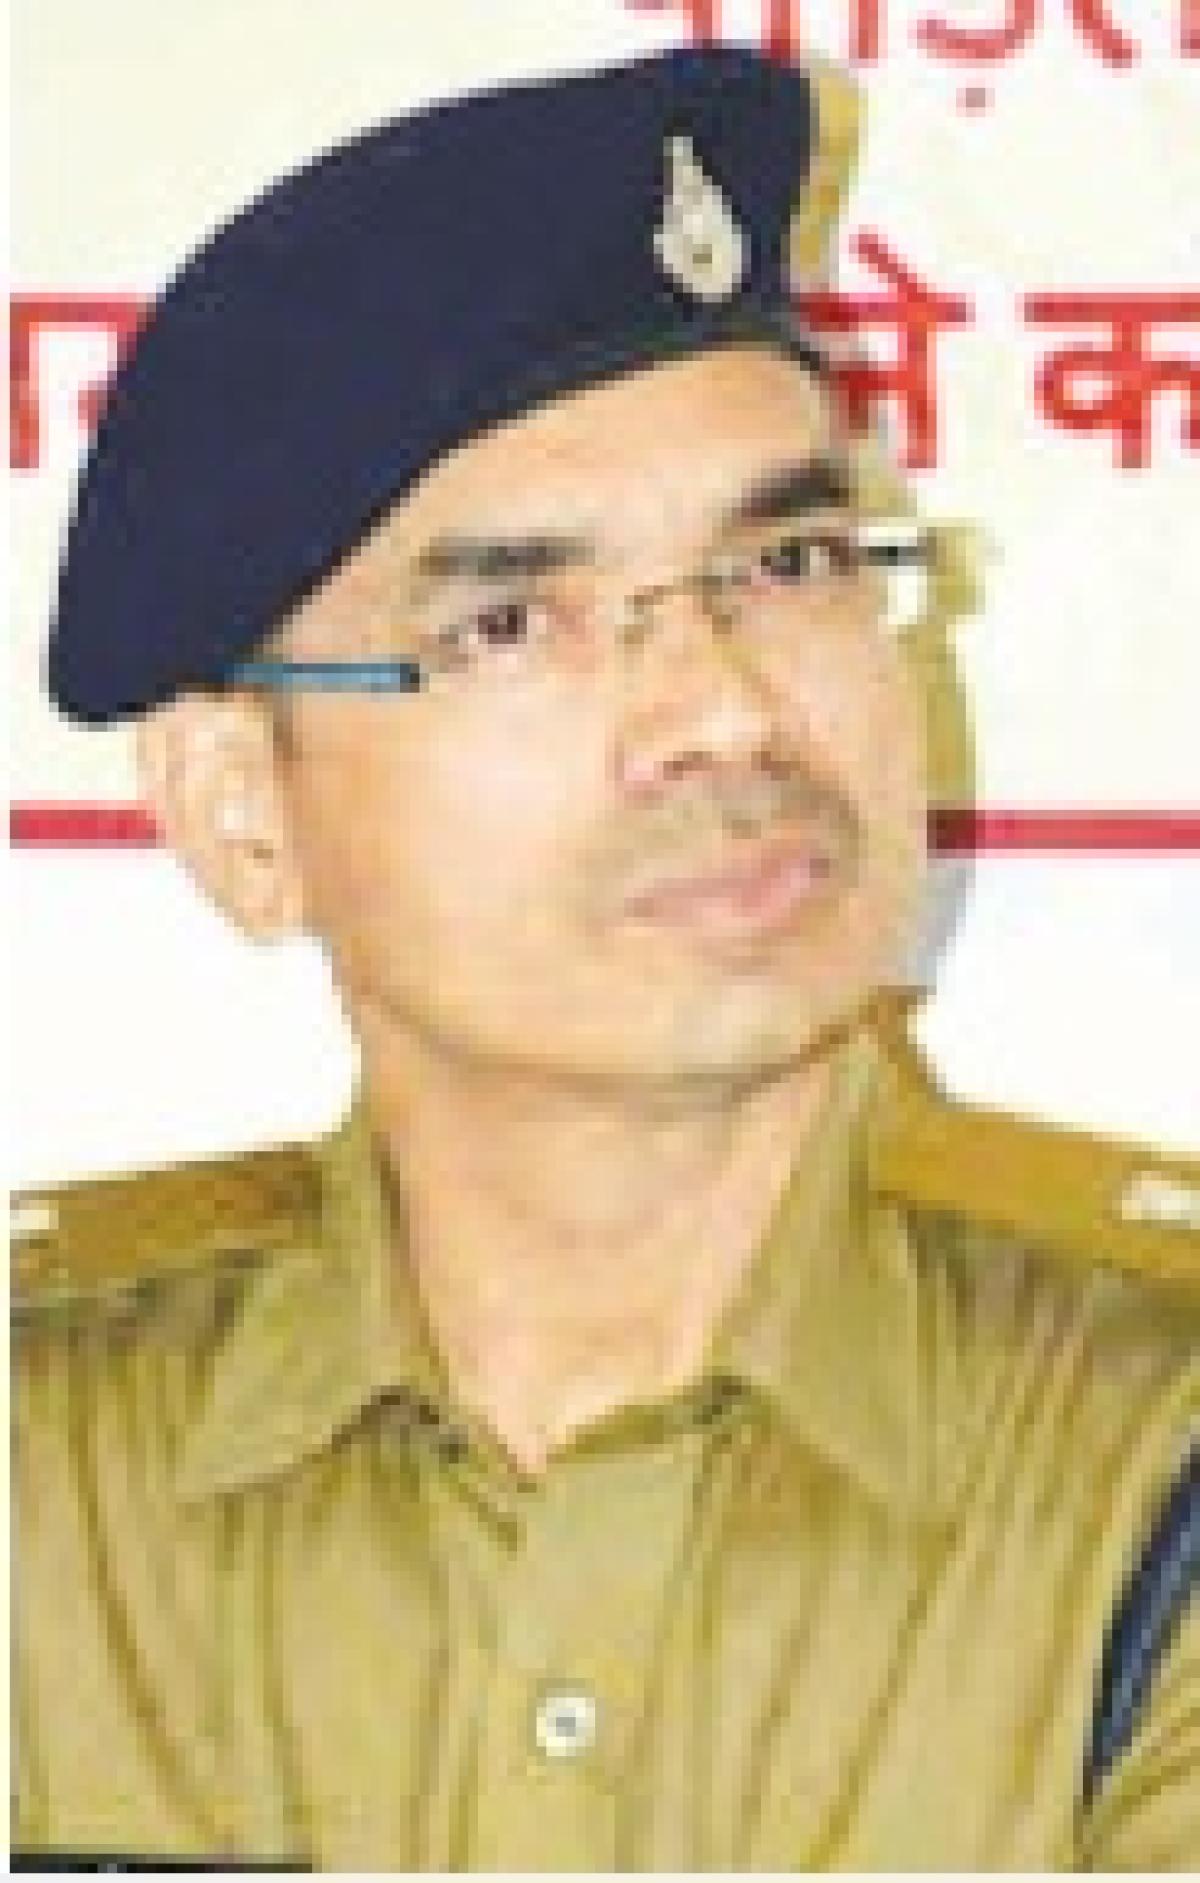 Bhopal: Boozers, gamblers learning traffic rules at Yatayat Park